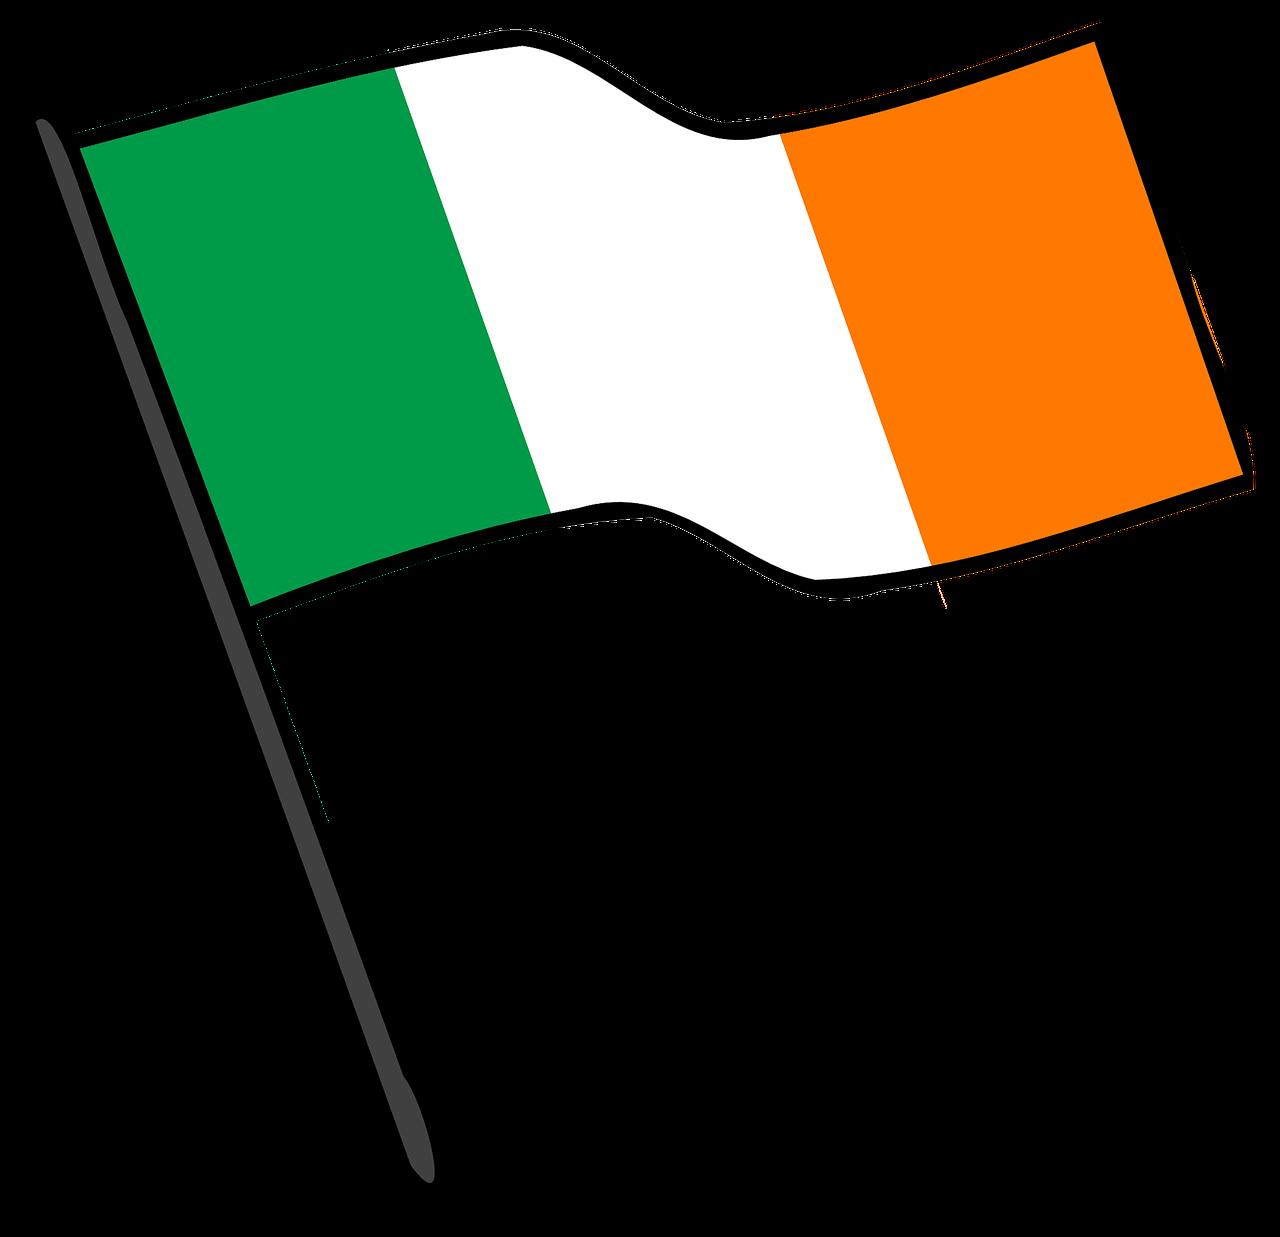 ирландский флаг картинки уже